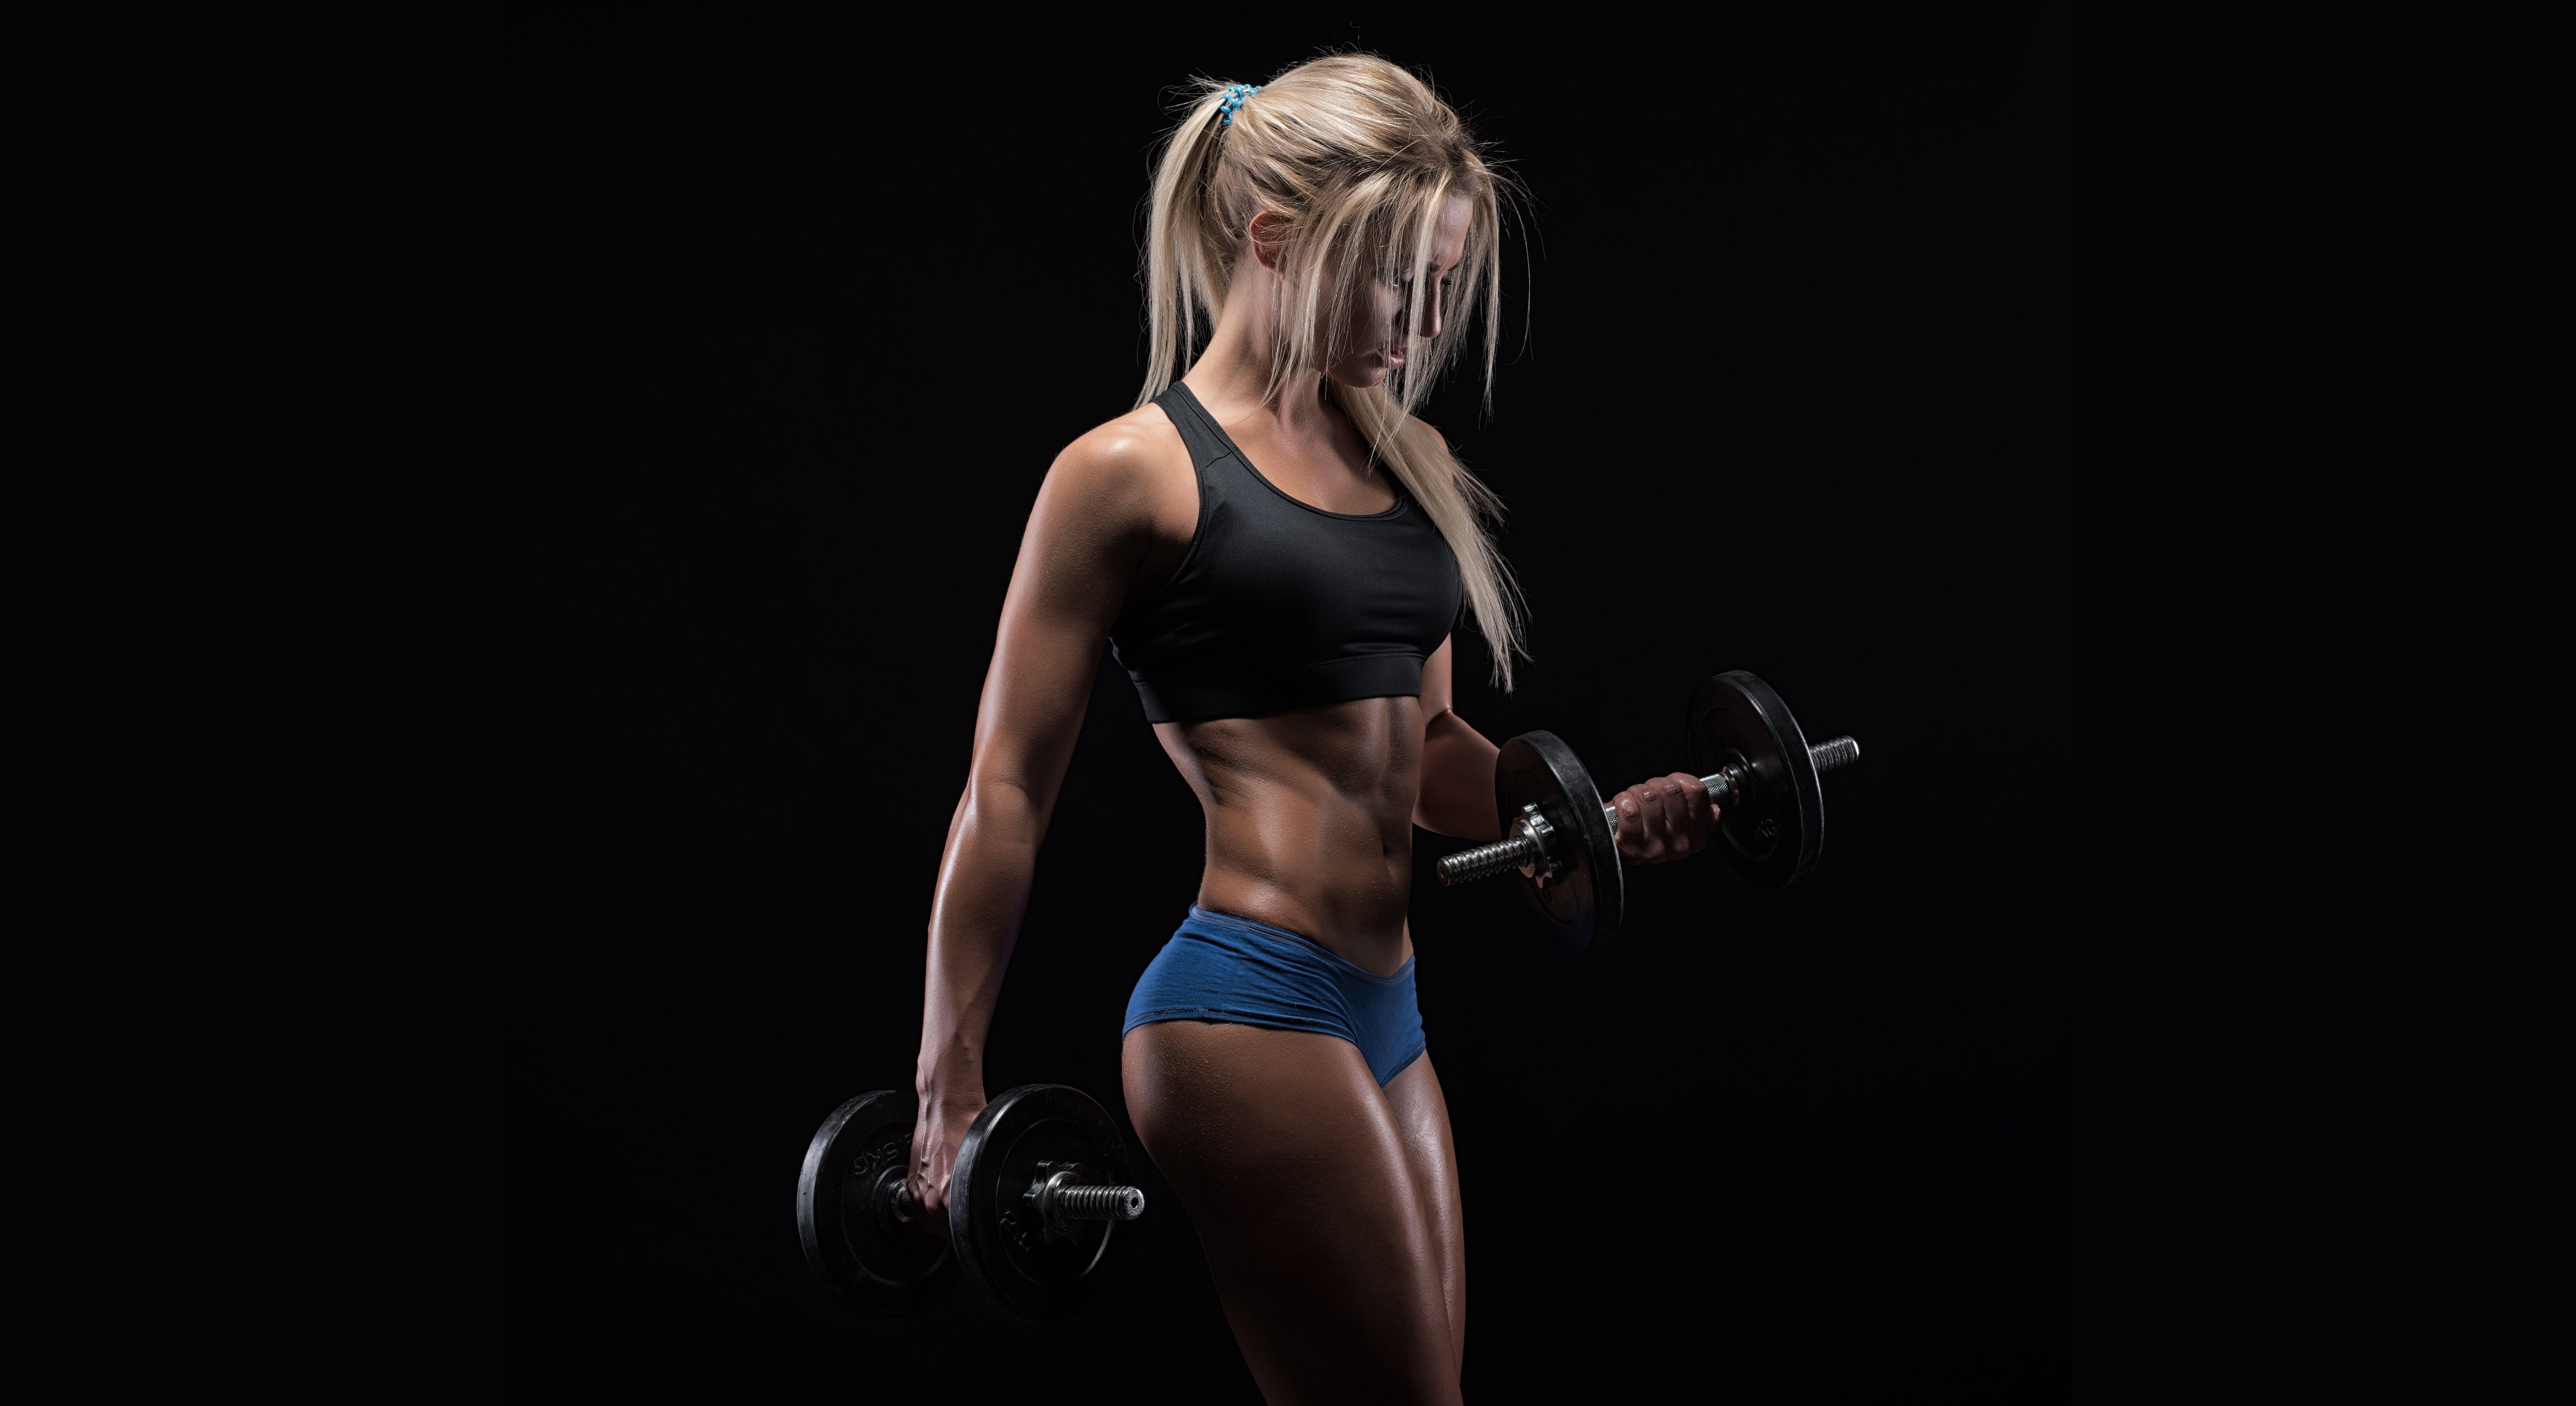 women's black sports bra #figure #muscles #blonde #pose #workout #fitness #dumbbells #8K #wallpaper...